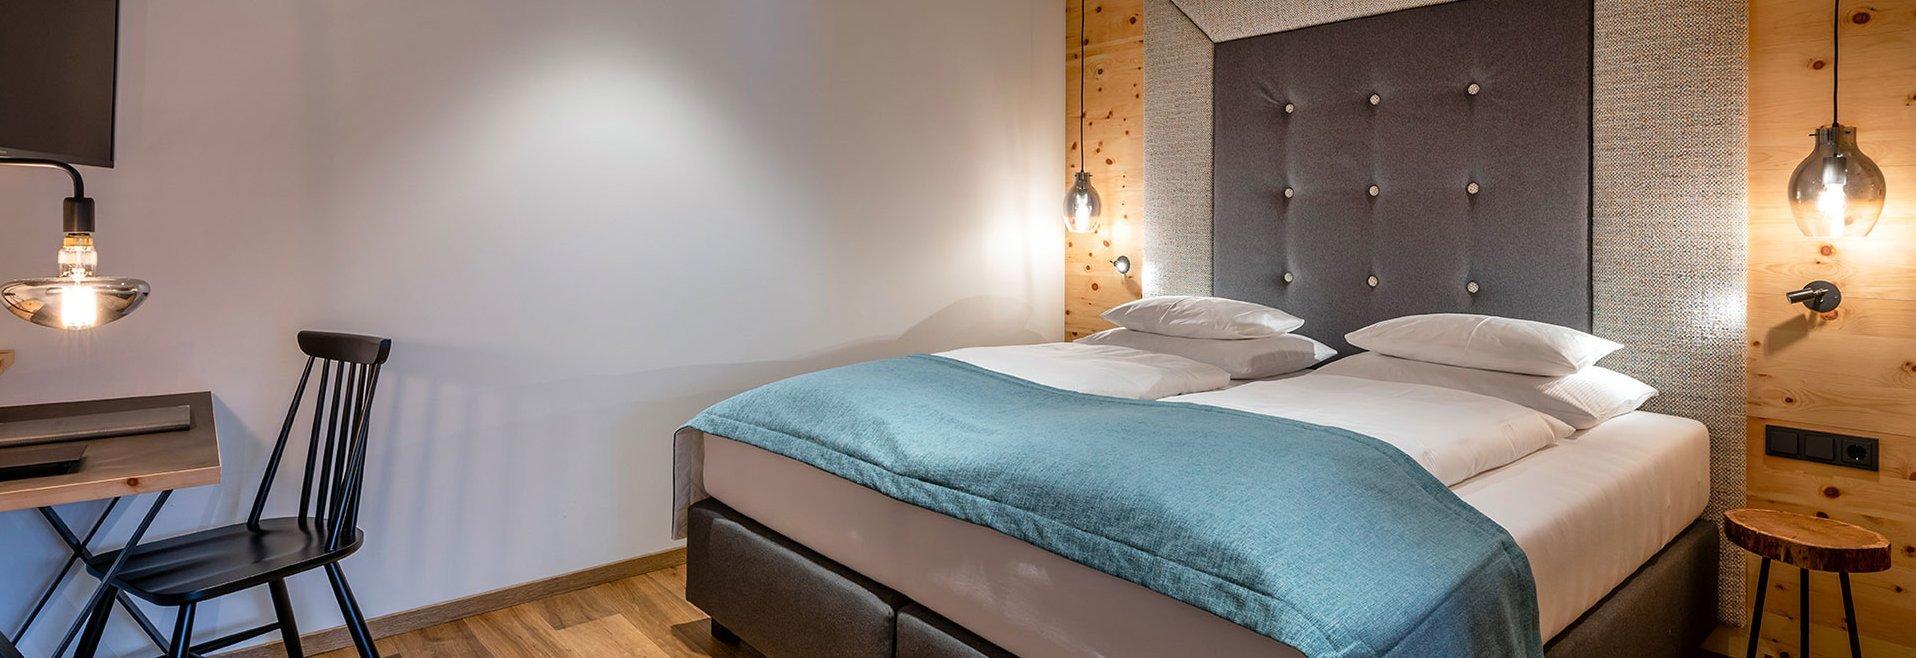 Stone pine suite Wohlfühlzeit double bed